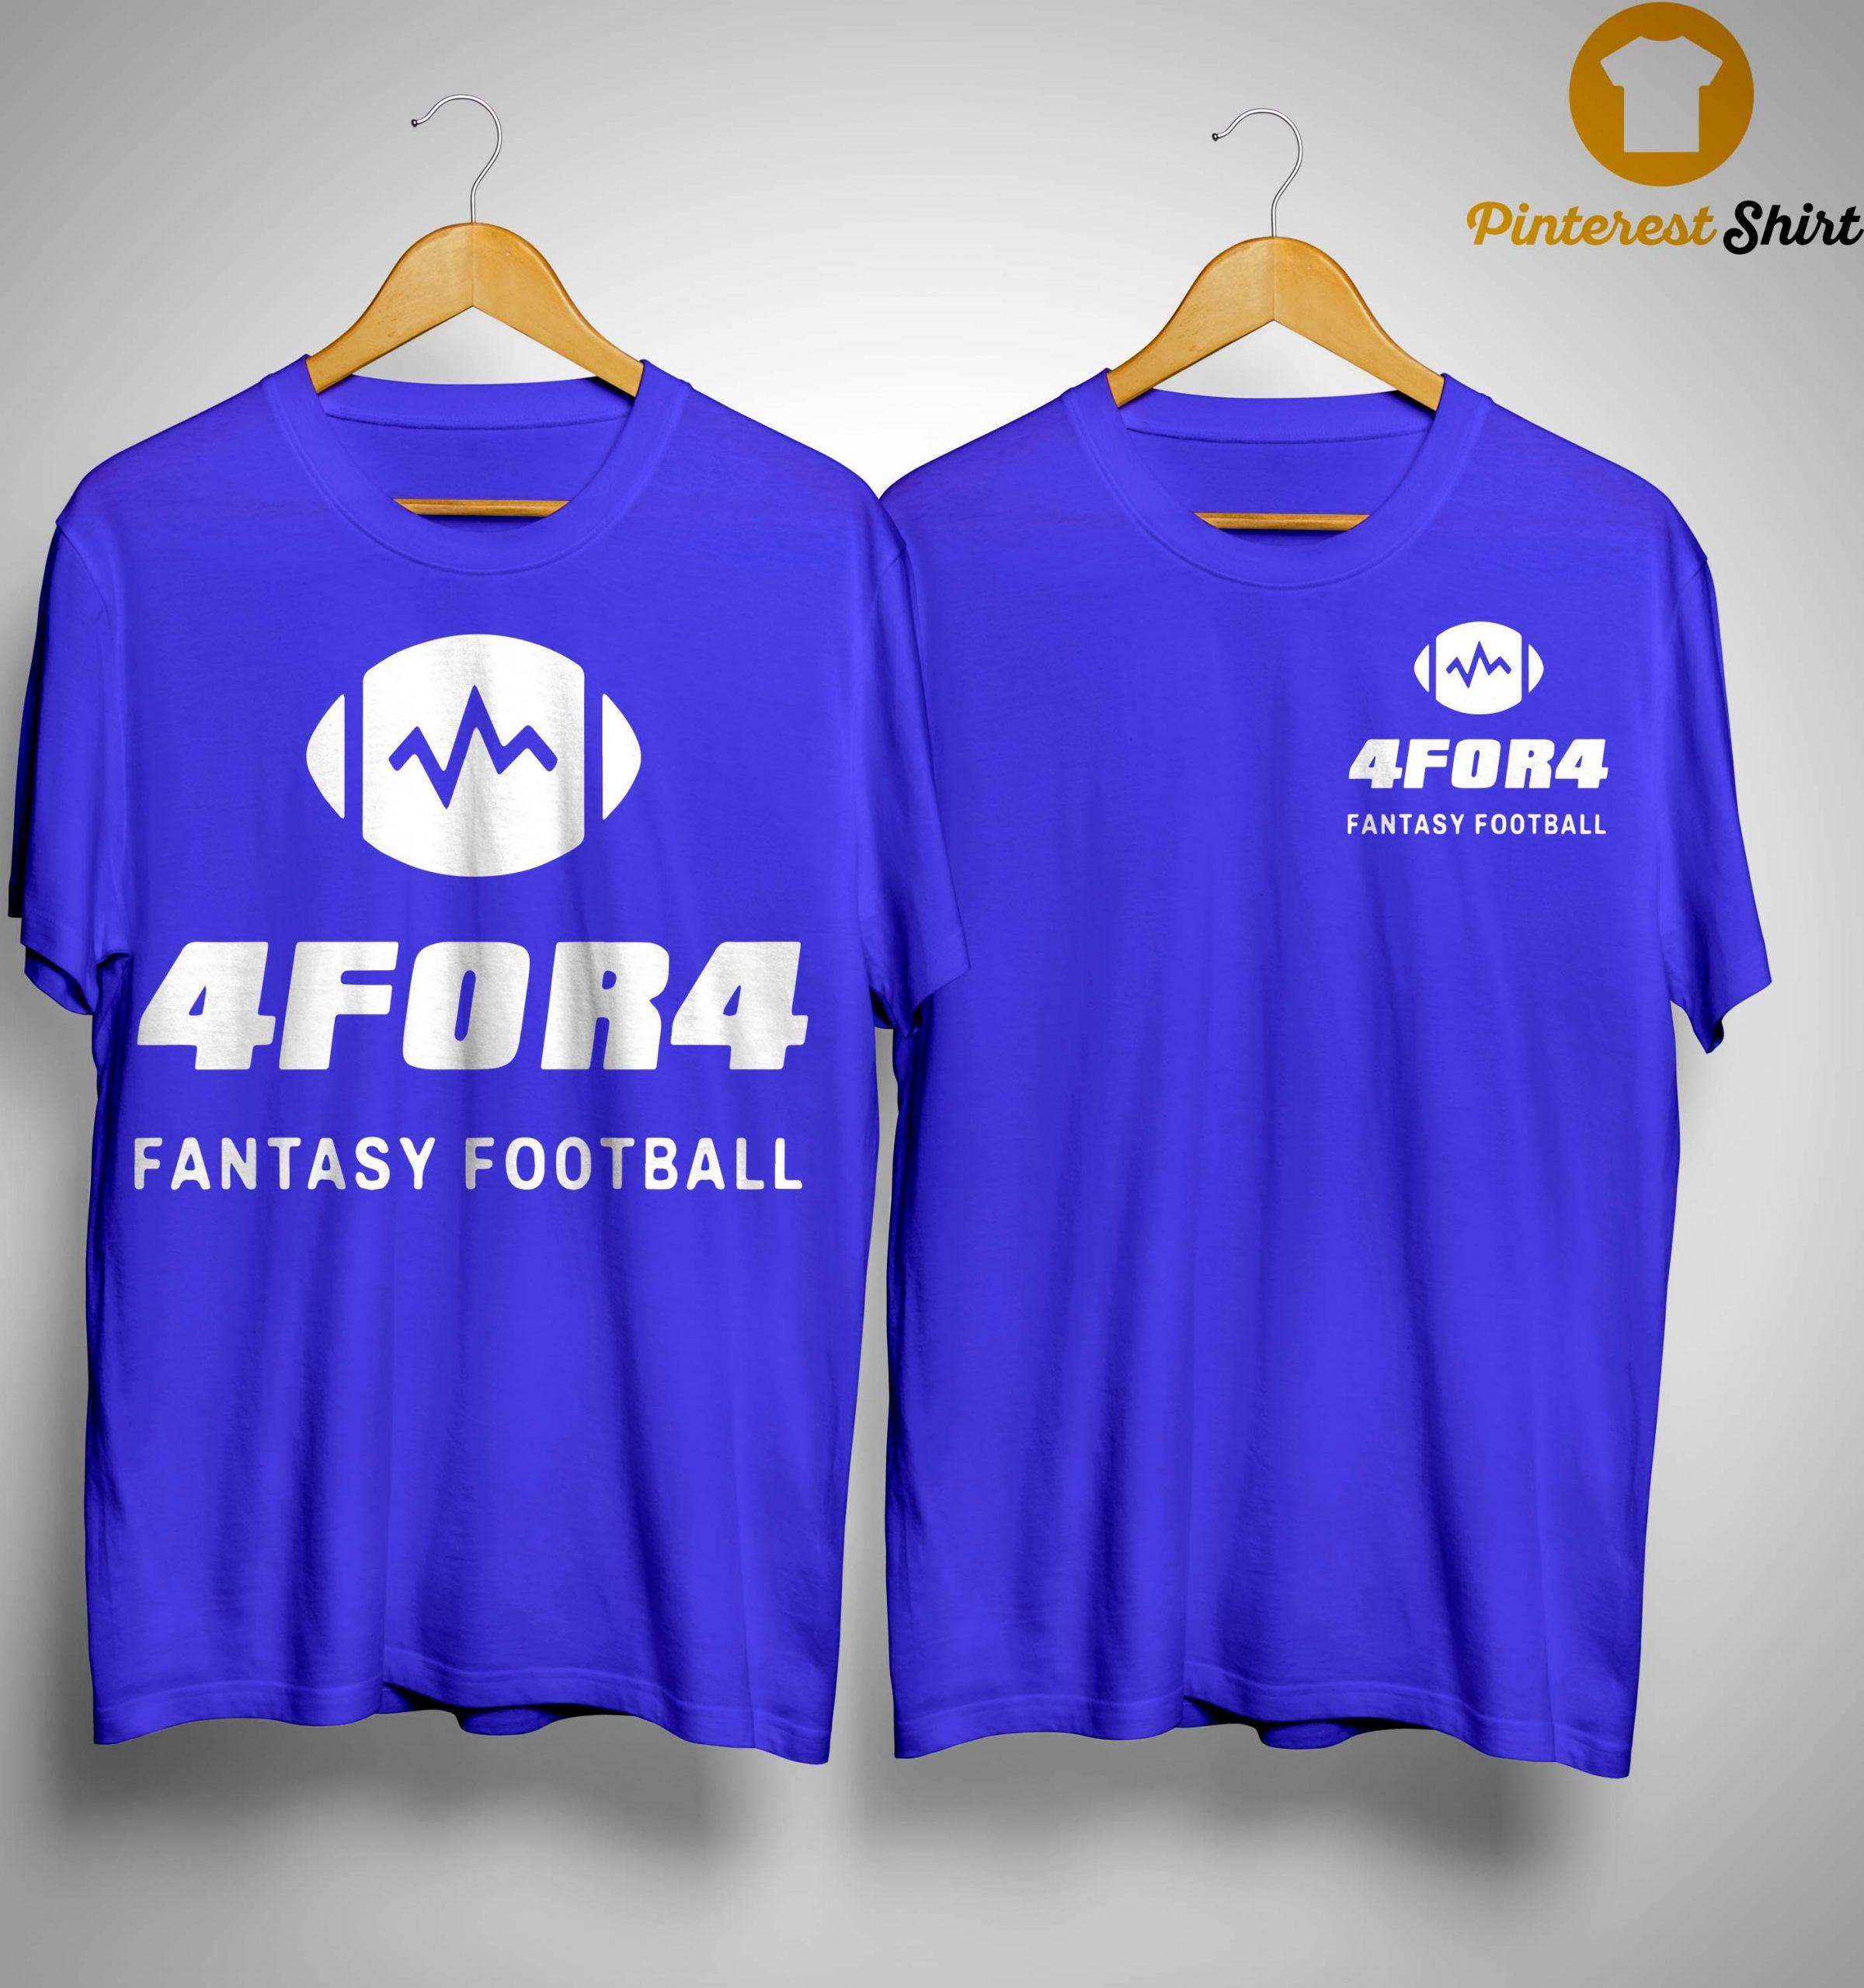 4for4 Fantasy Football Shirt